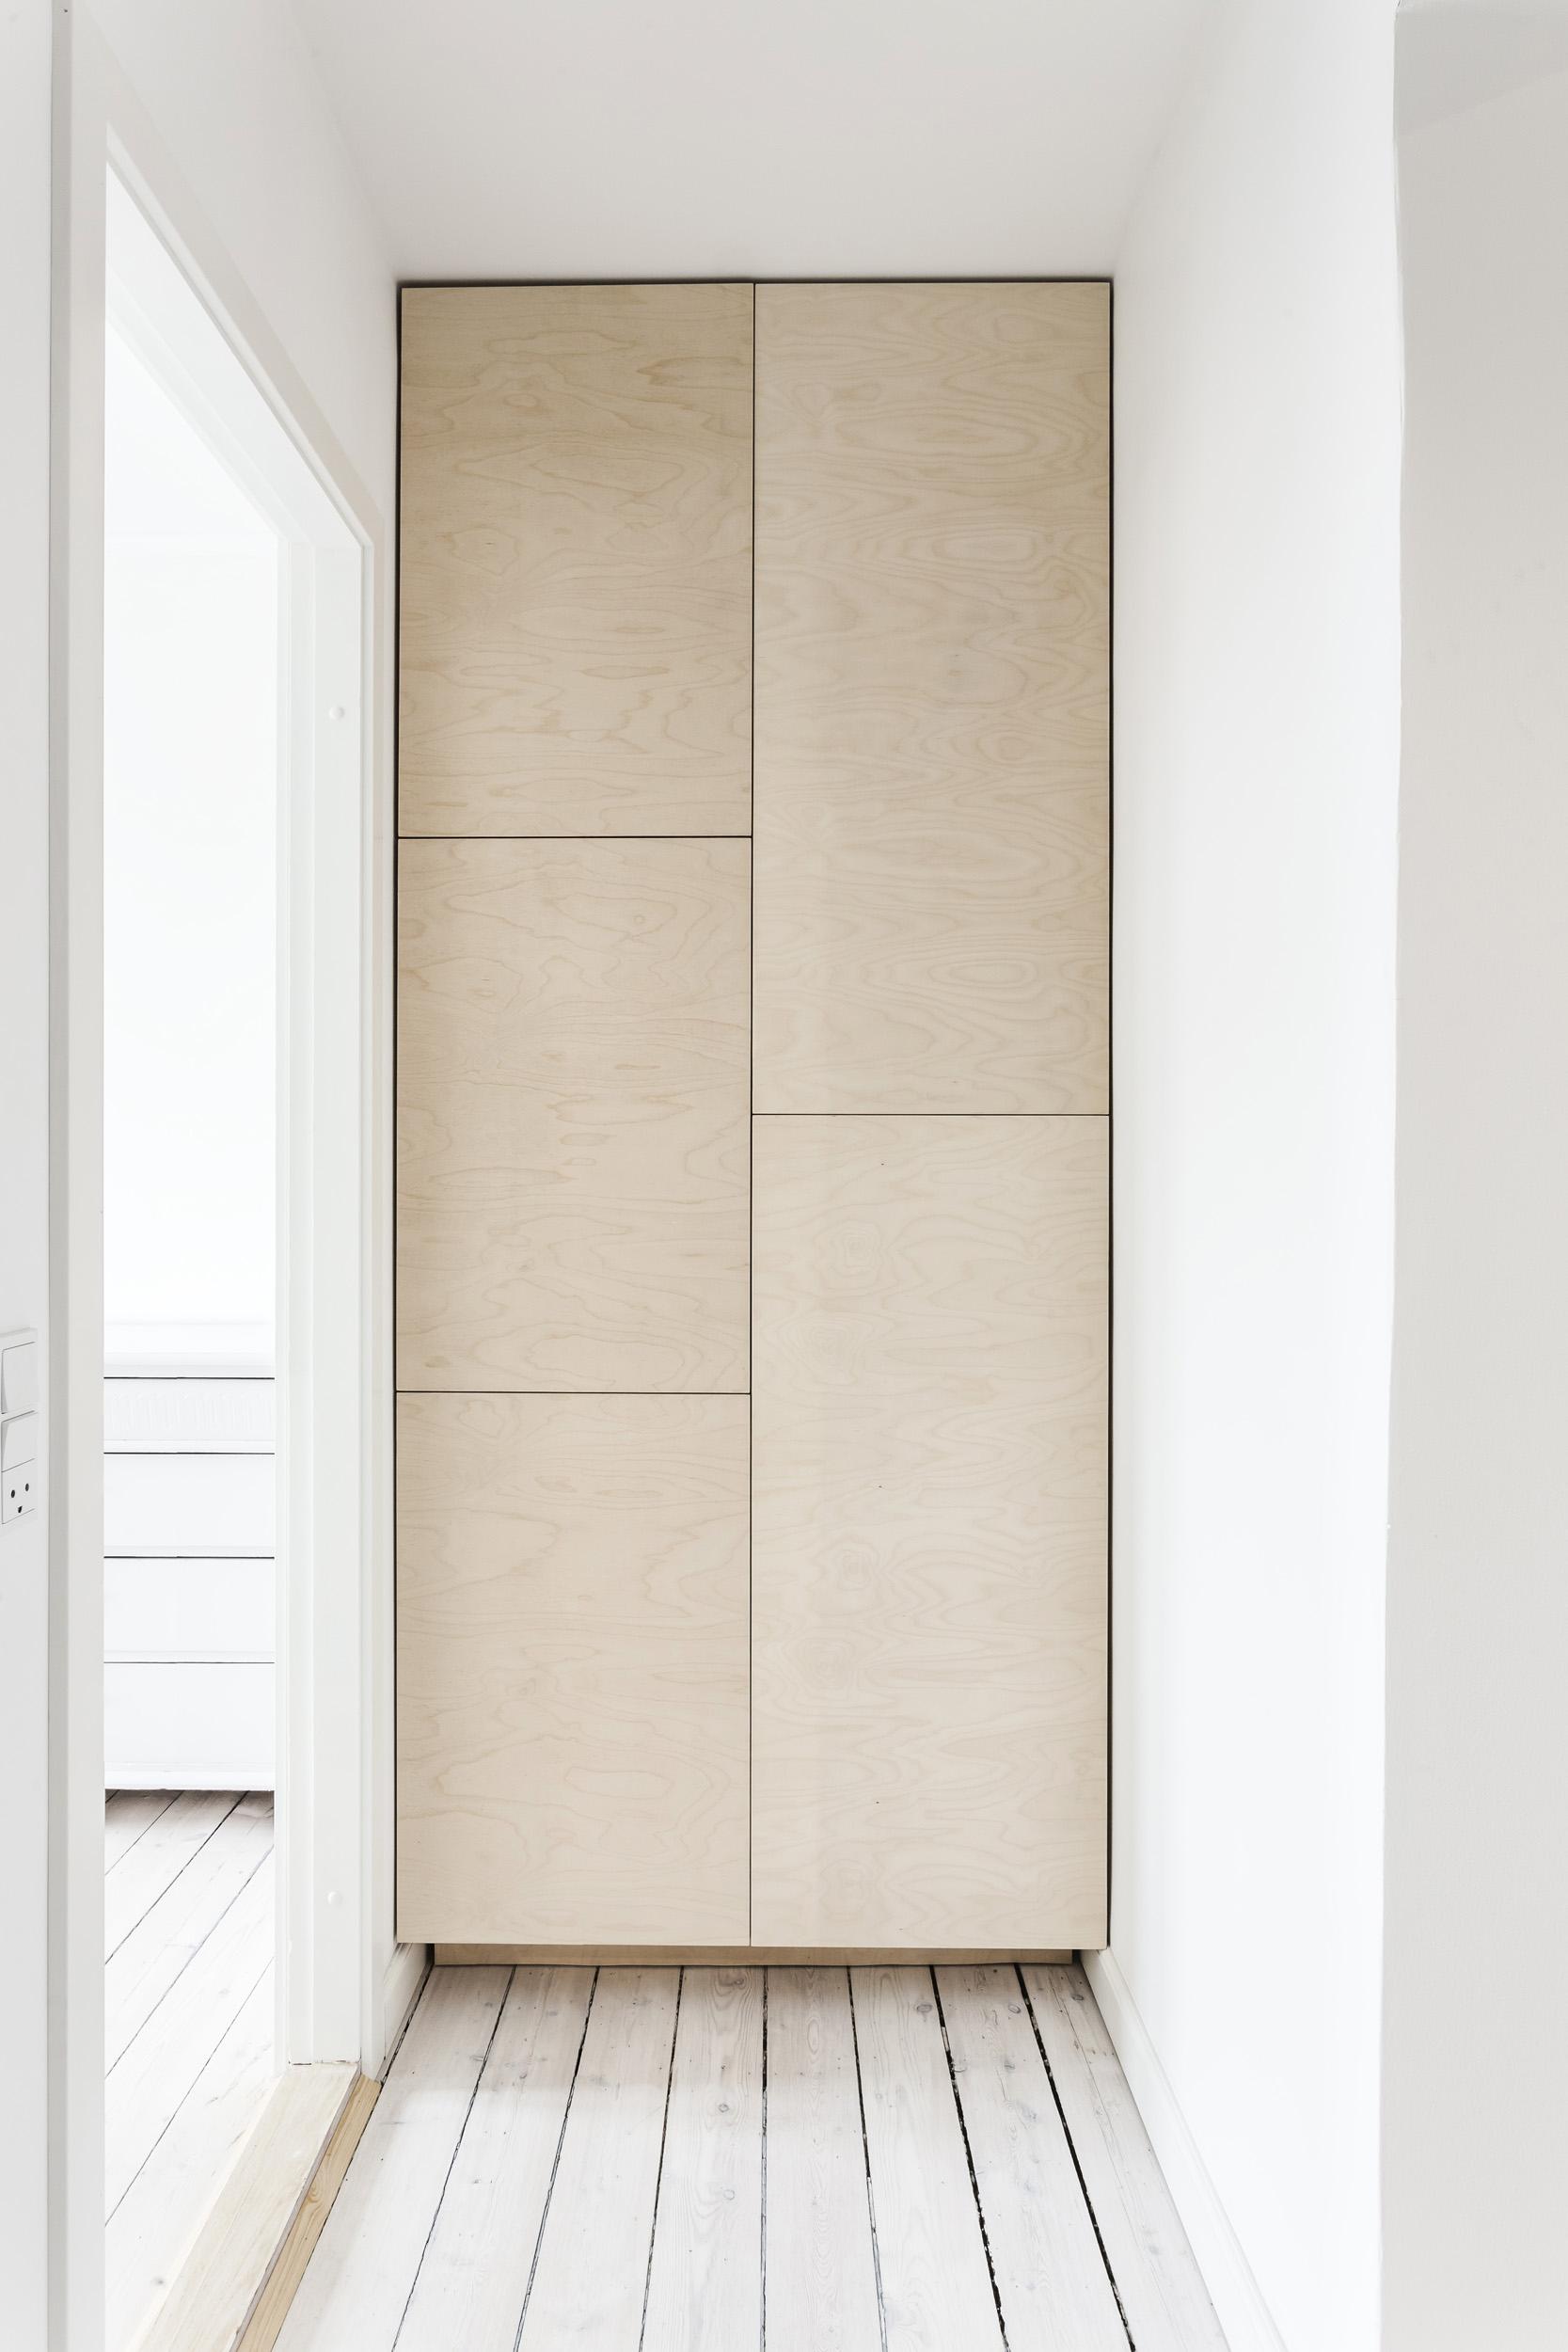 0129-m1v1-wardrobe-storage-entry-hall-cabinet-birch-buiilt-in-minimal-stay-project_1-2500x.jpg